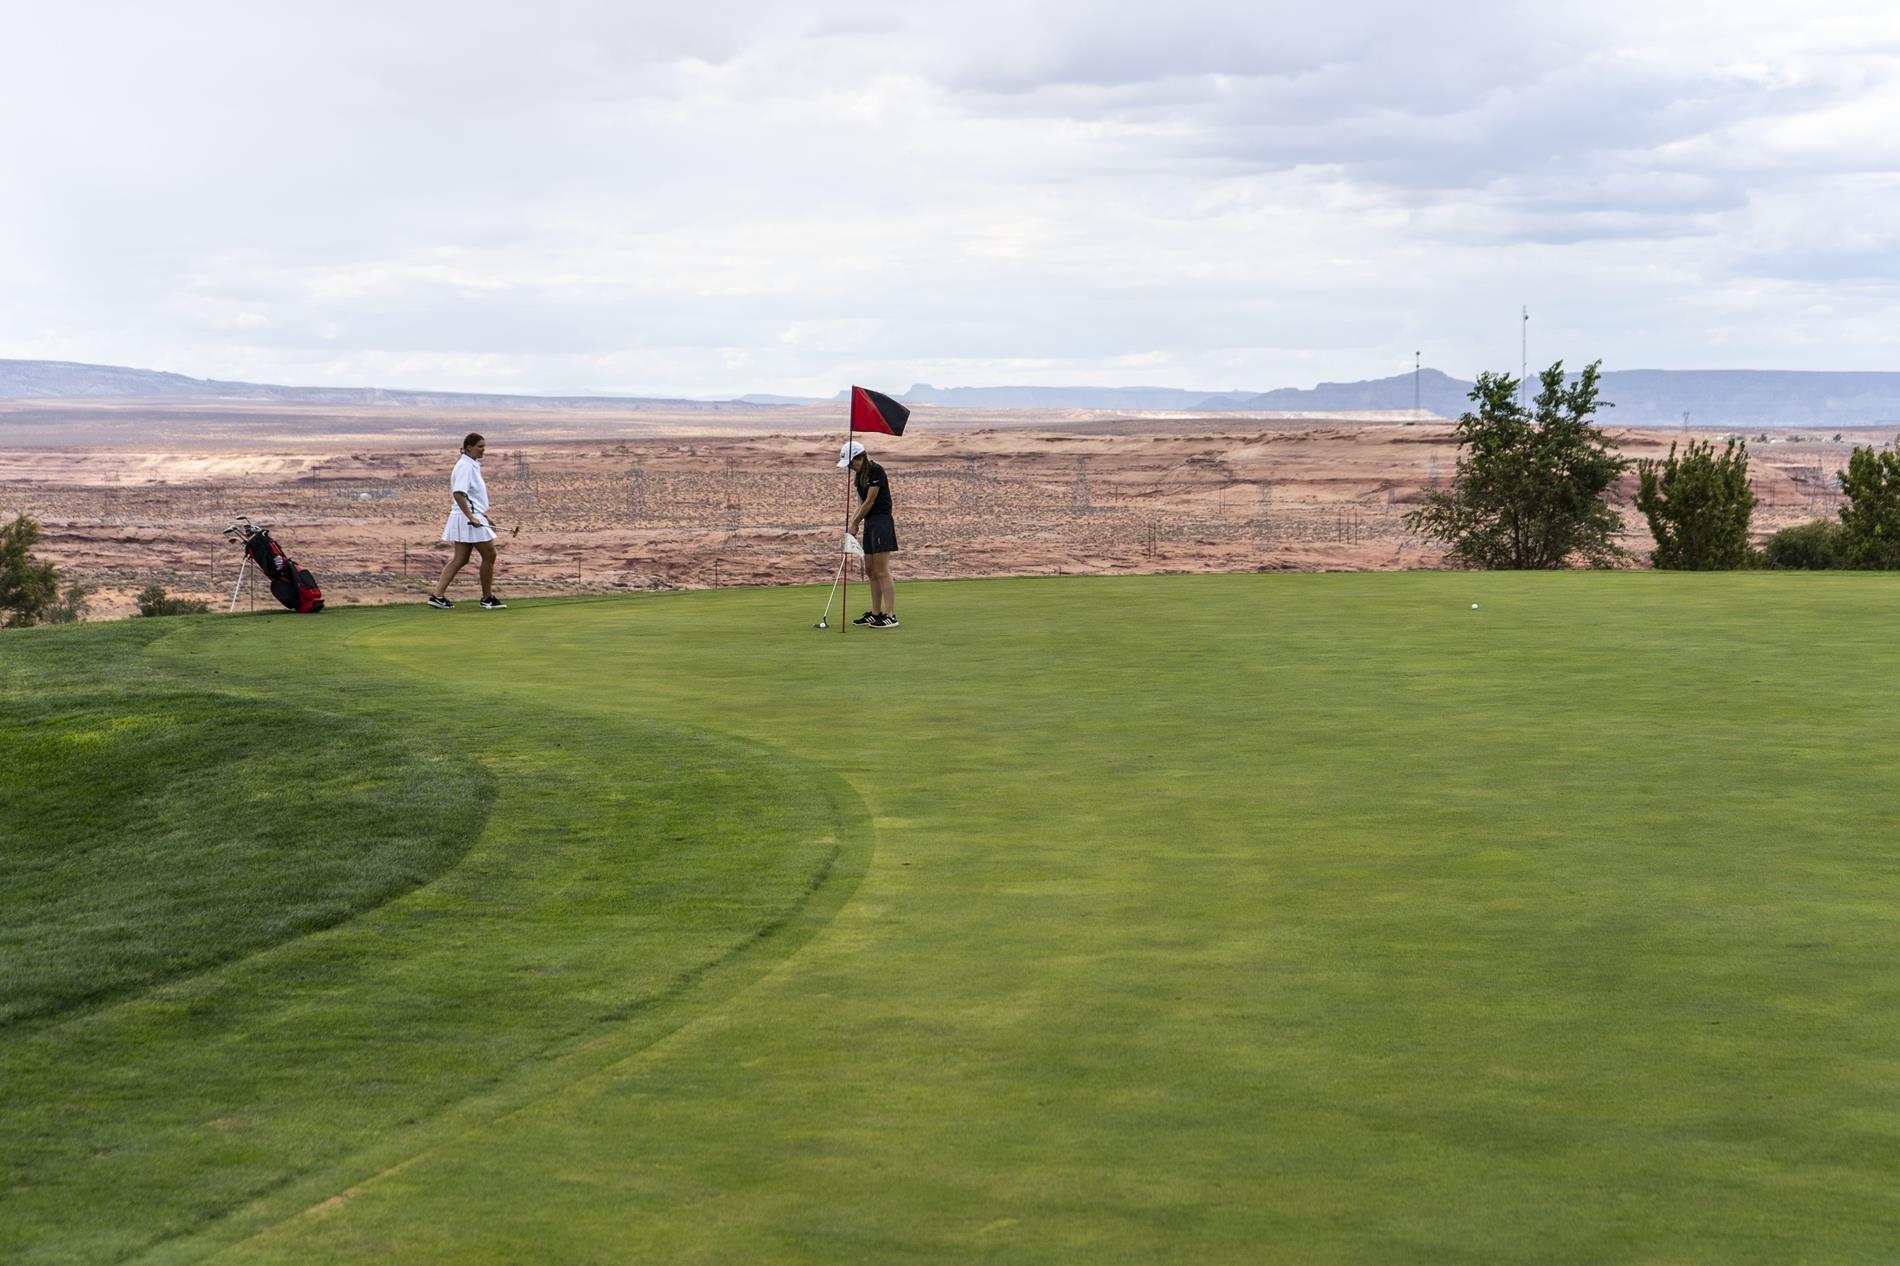 photo of girls playing golf